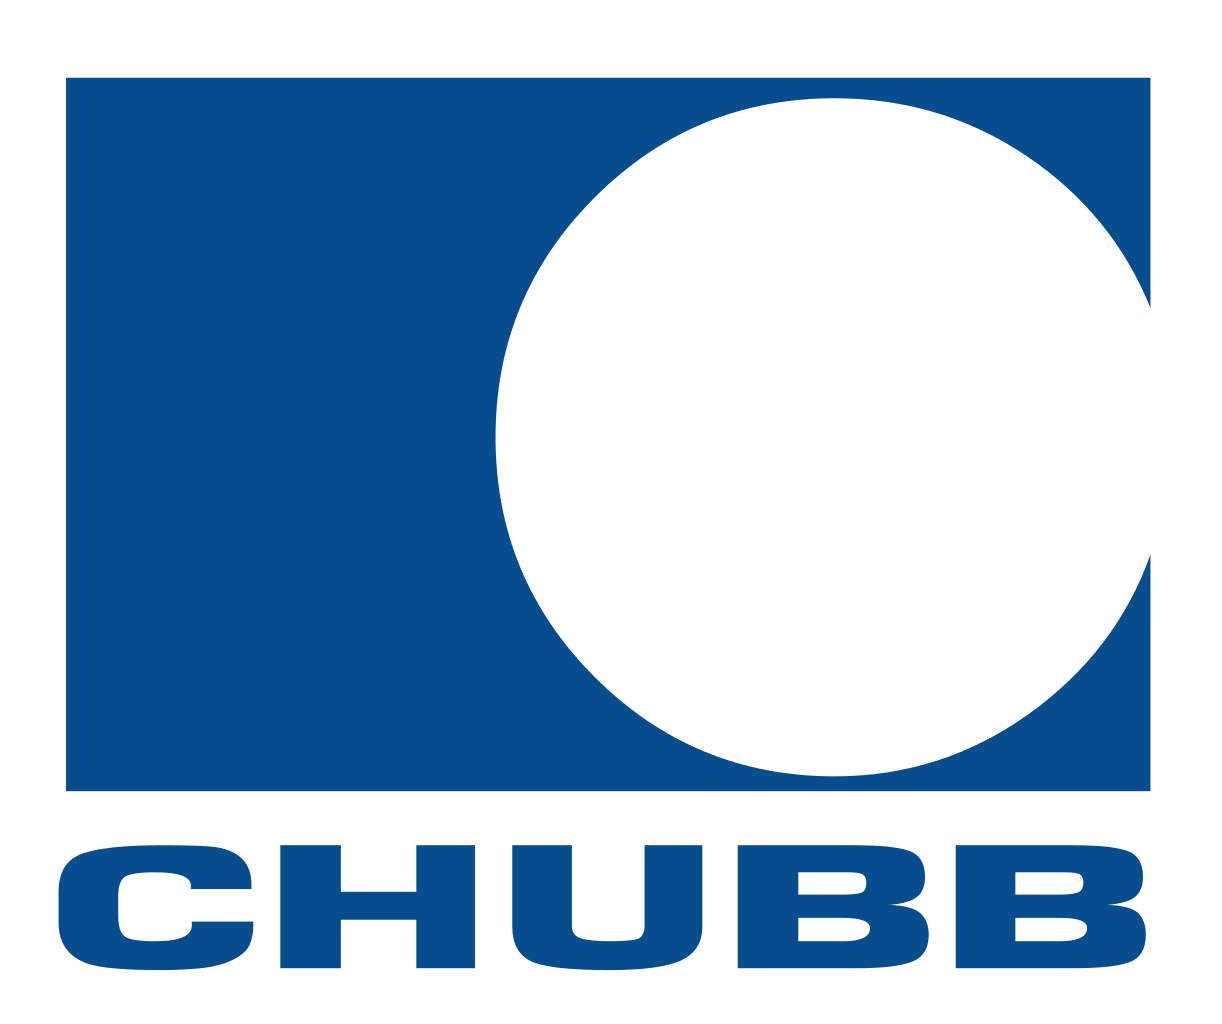 Chubb